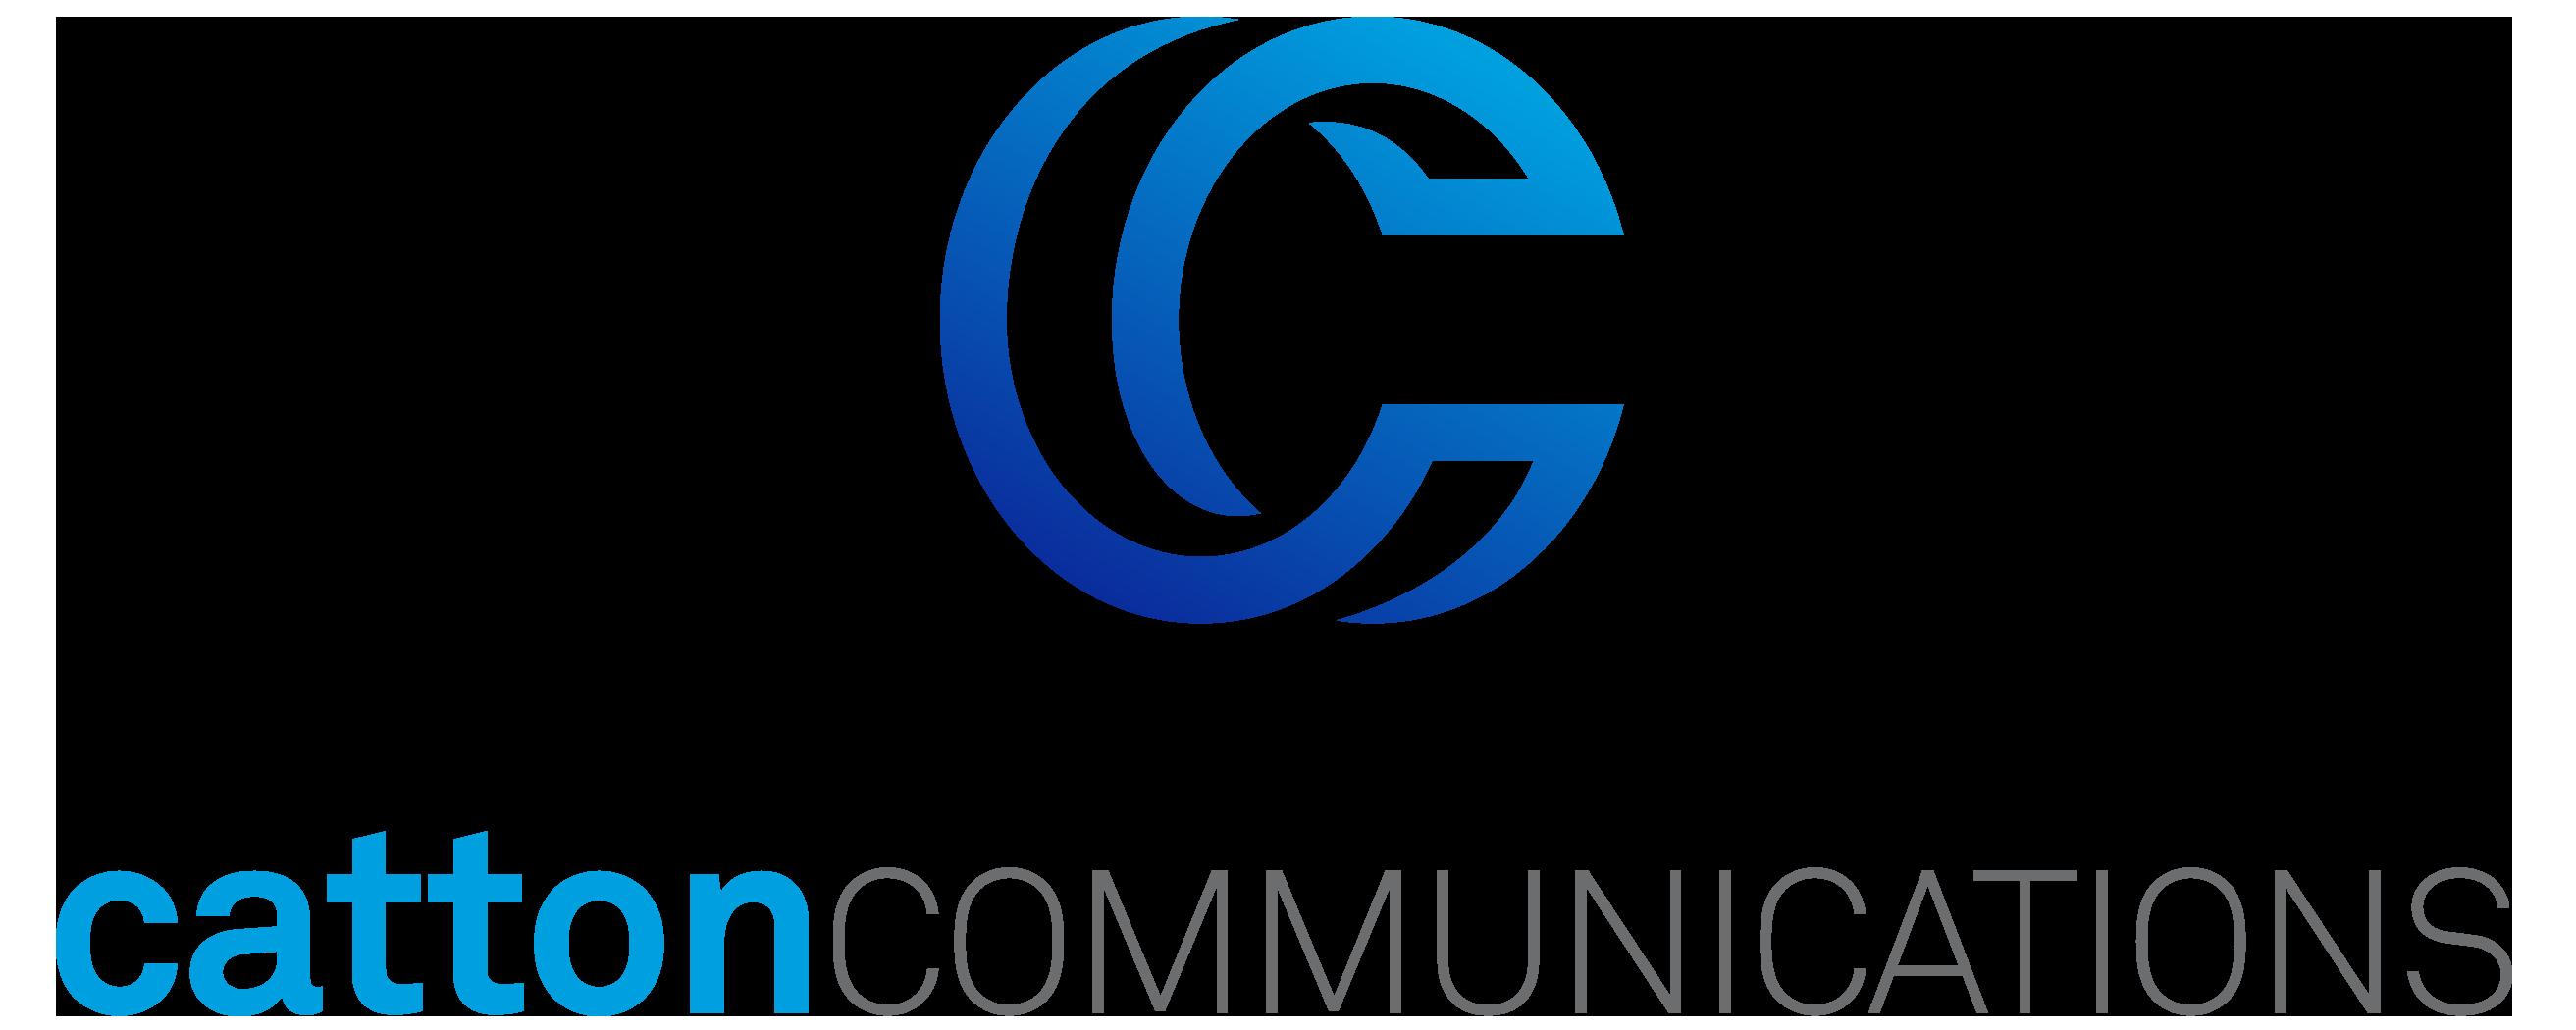 Catton Communications